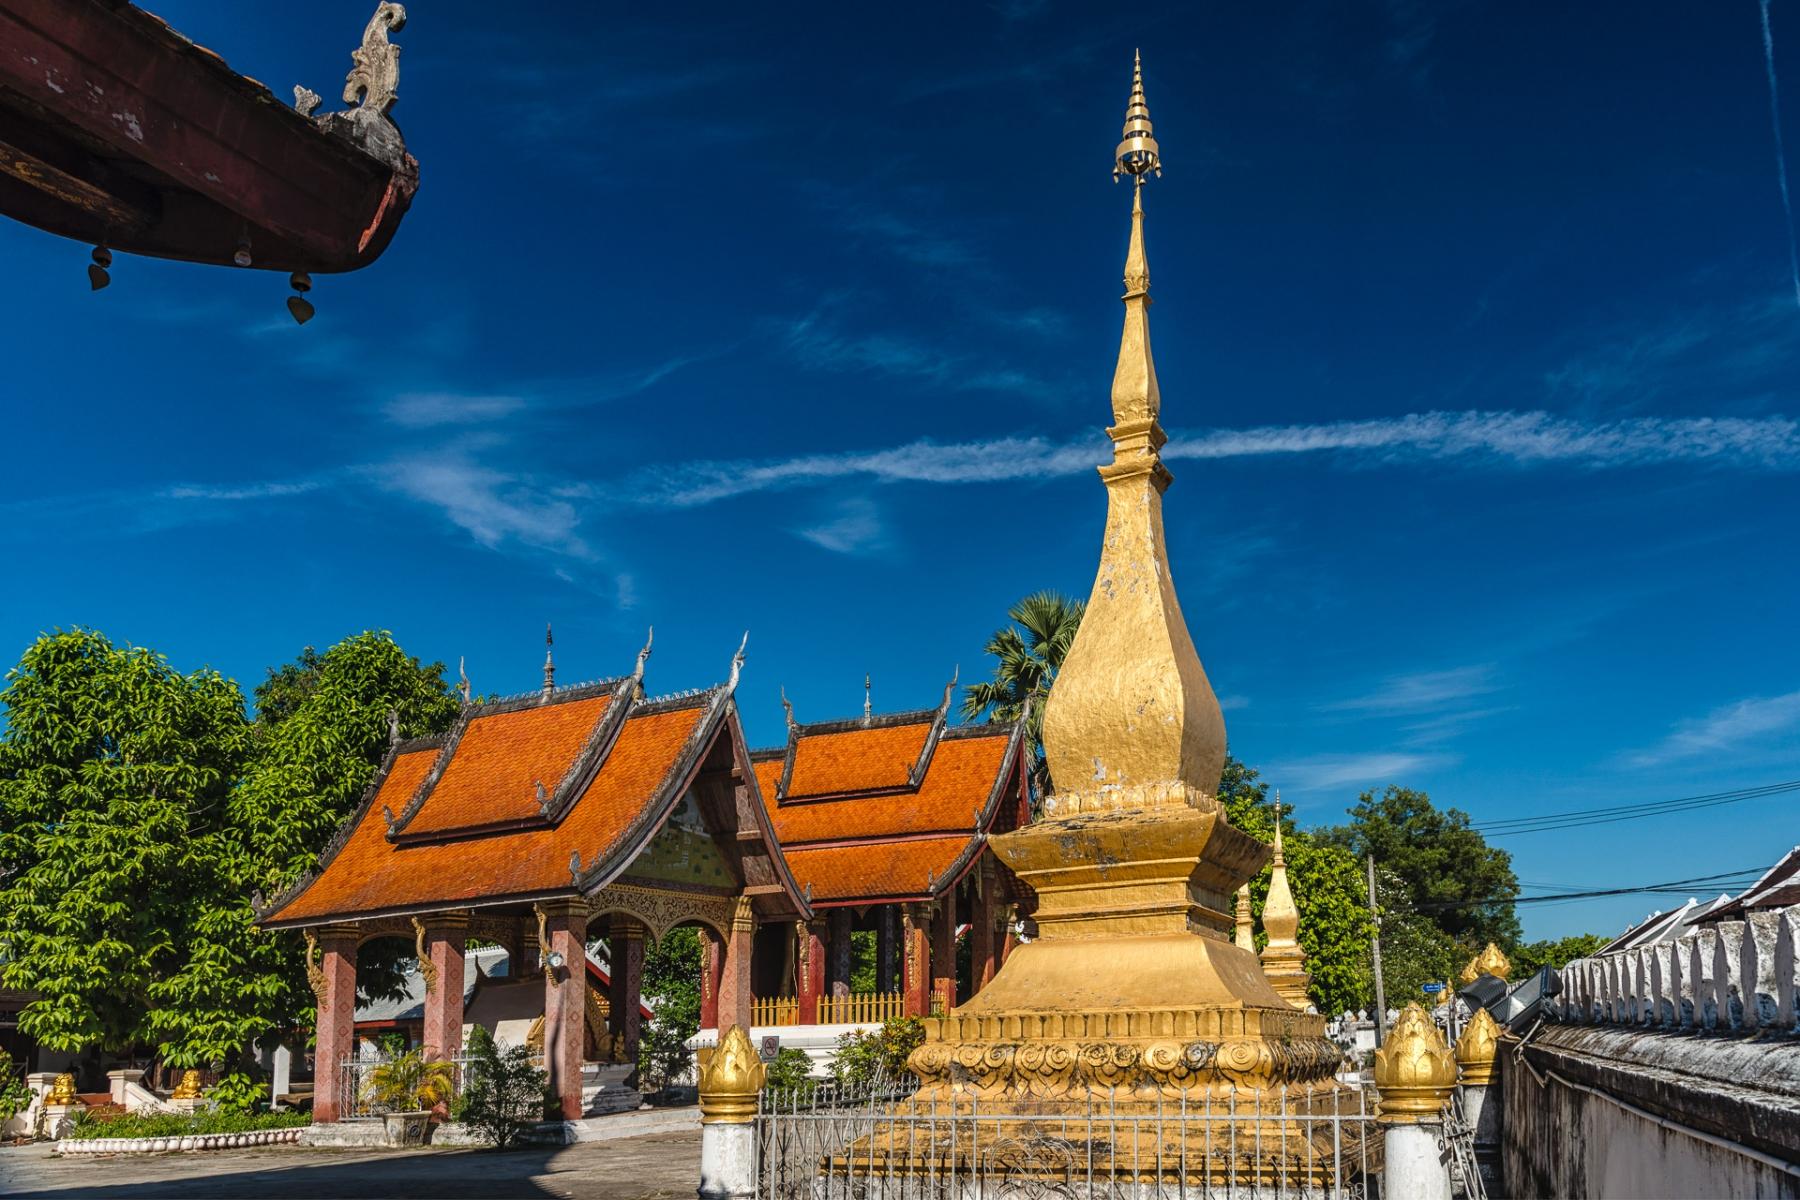 Luang Prabang - Wat Sensoukaram